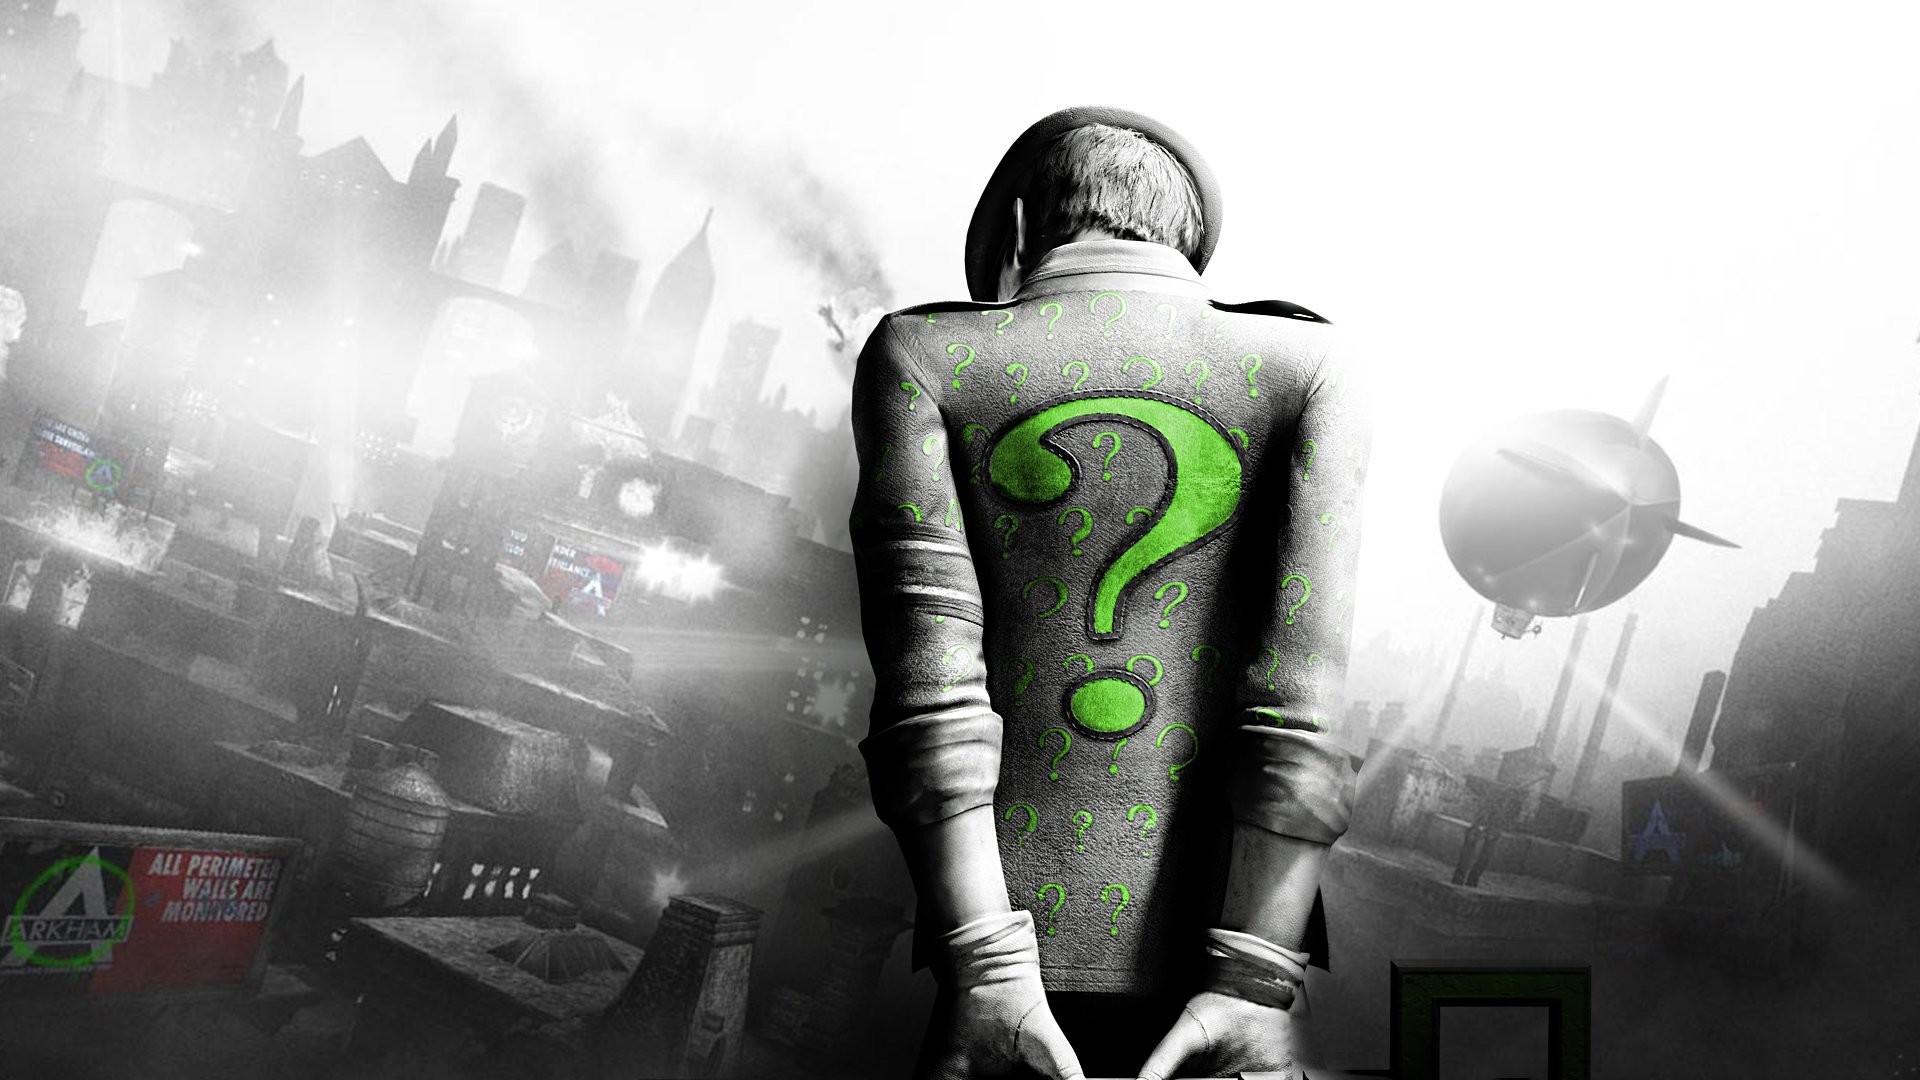 Riddler Question Mark Wallpaper 73 Images